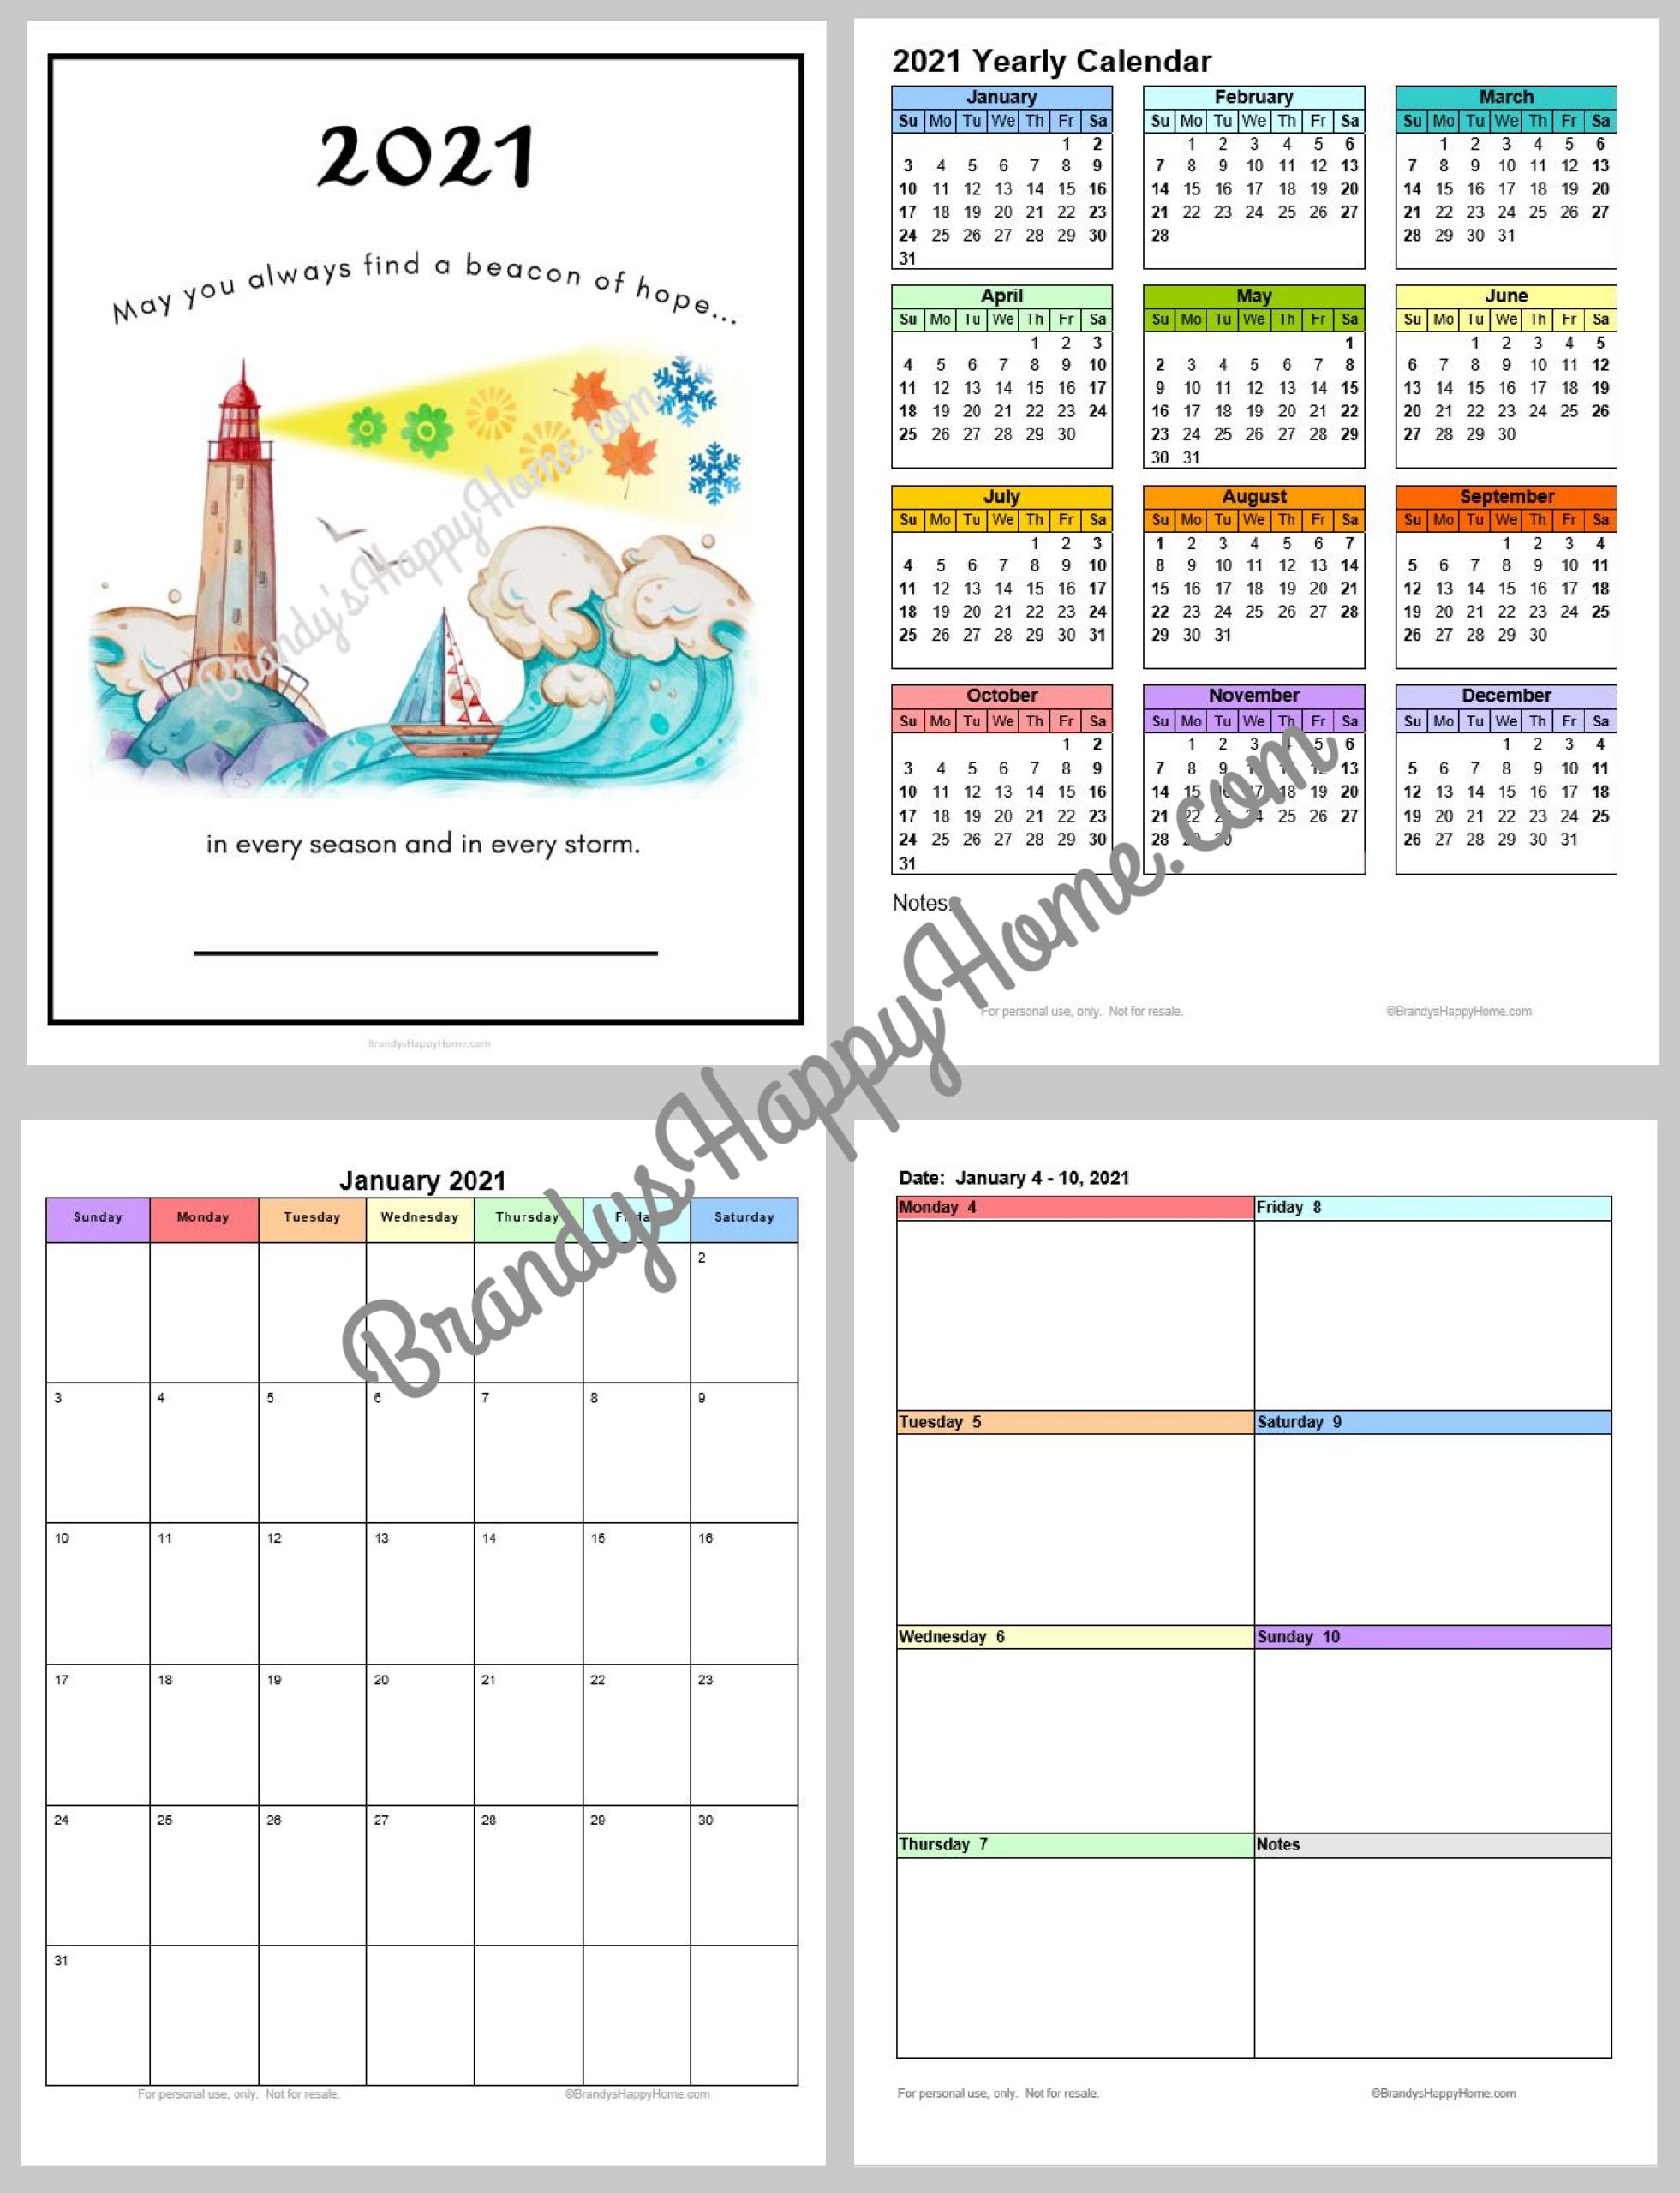 Free 2021 Calendar Planner Printables regarding 2021-2021 Two Year Planner: 2021-2021